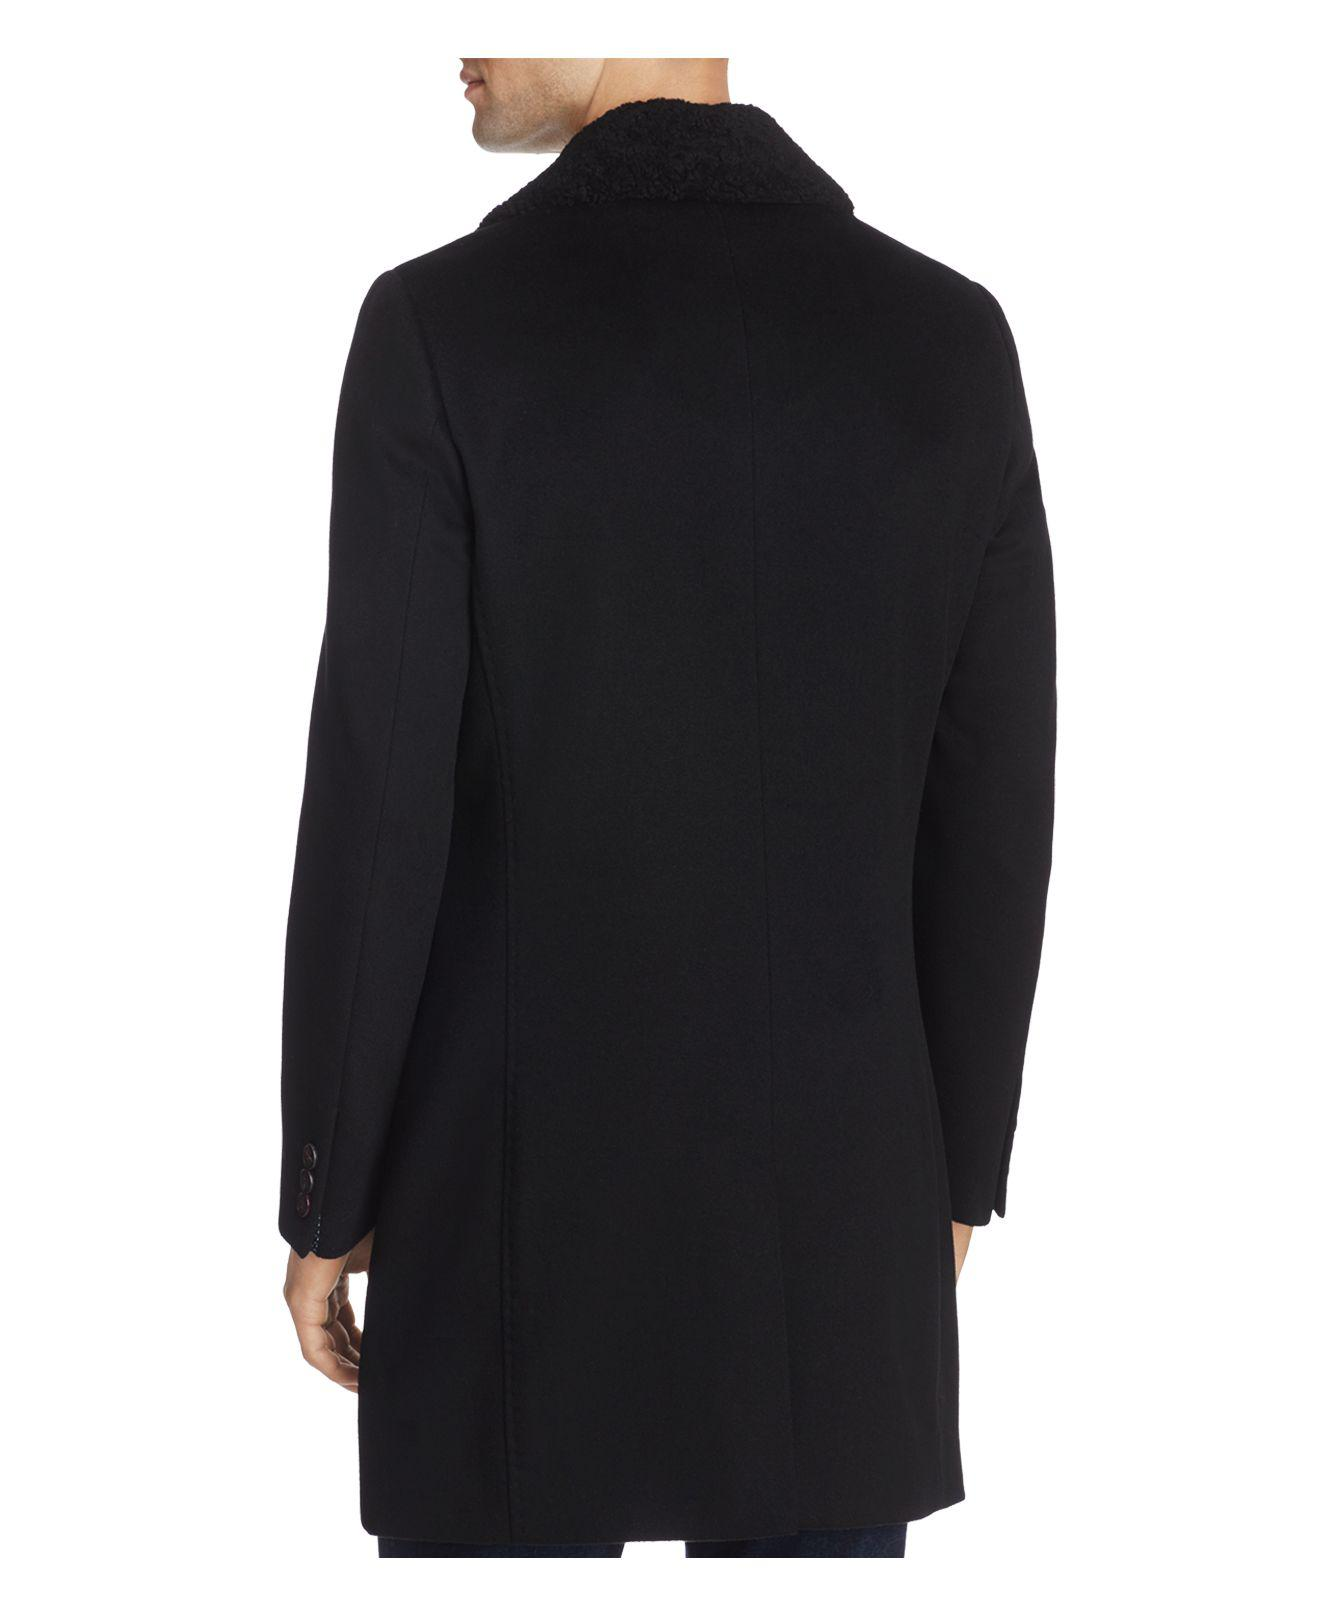 Ted Baker Nolan Endurance Shearling Coat In Black For Men